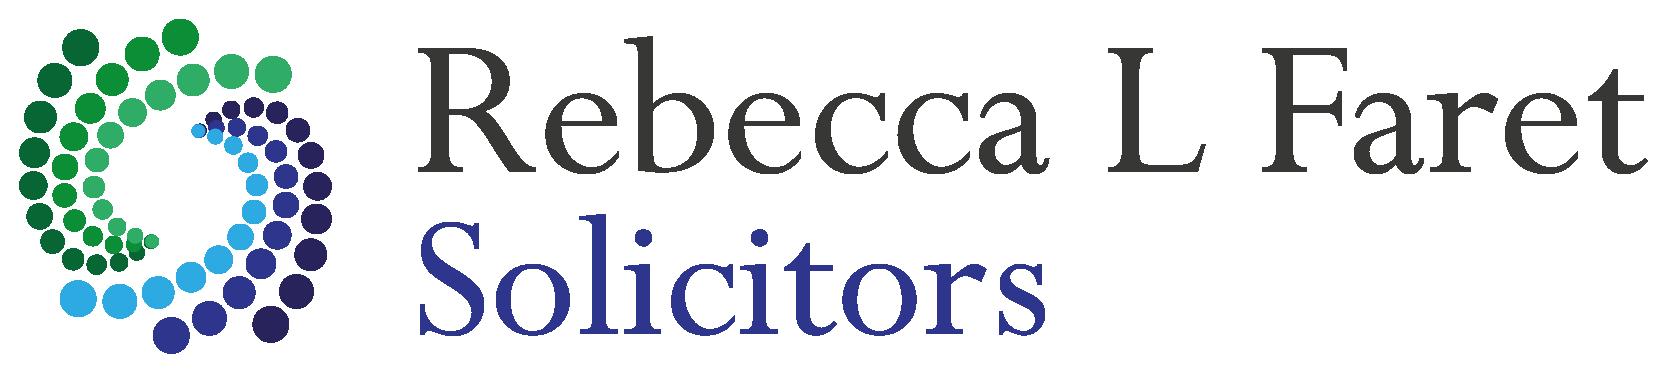 Rebecca L Faret Solicitors